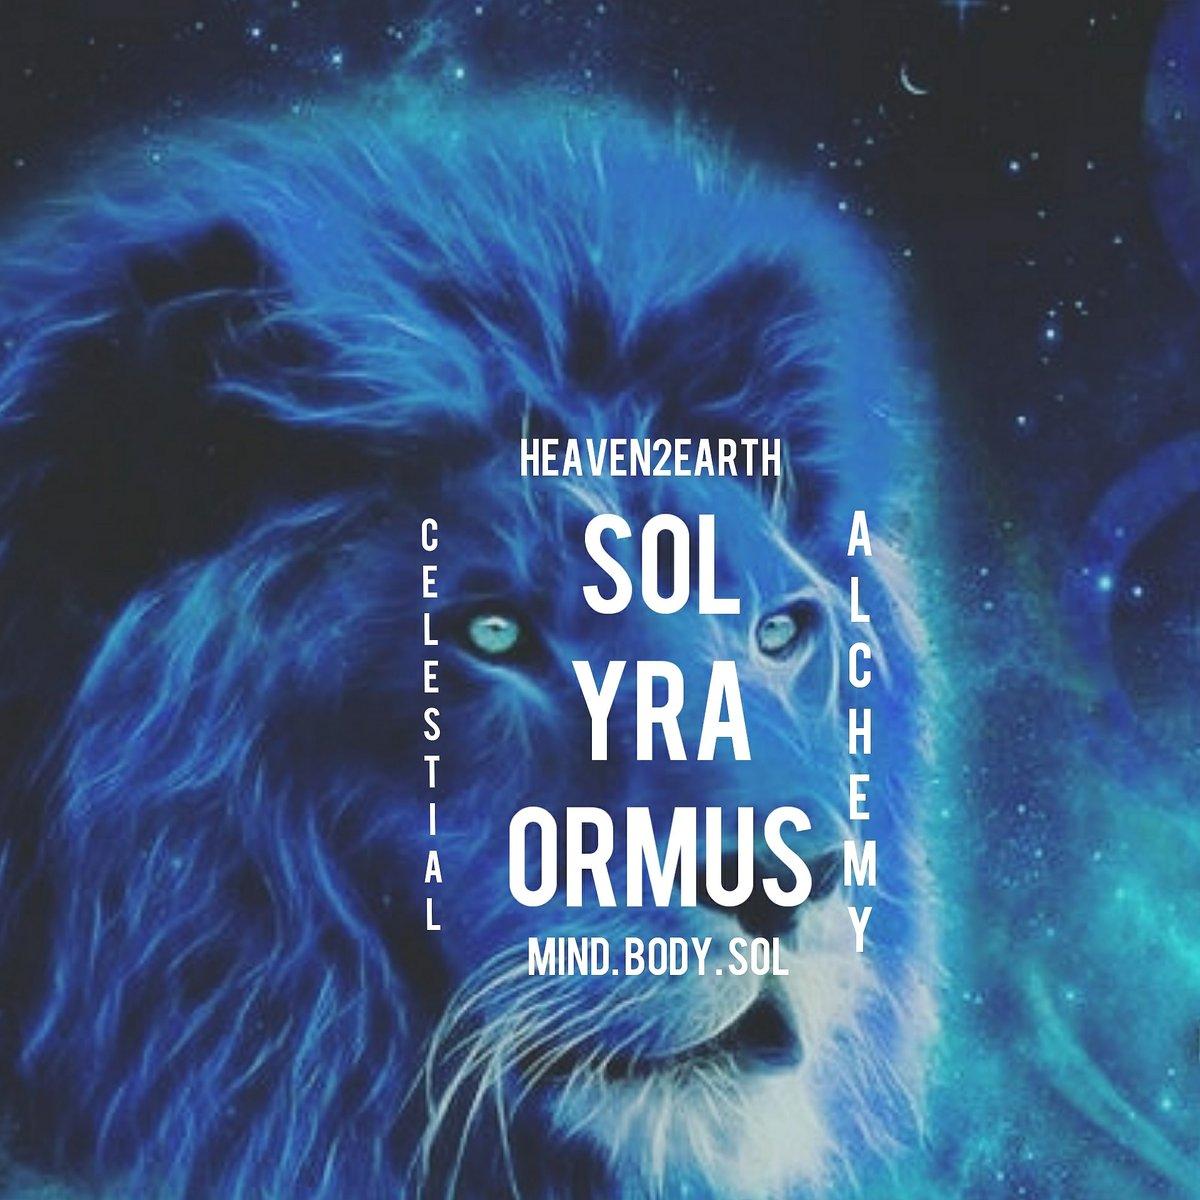 ORMUS BIOFEEDBACK STUDY | solyraormusalchemy